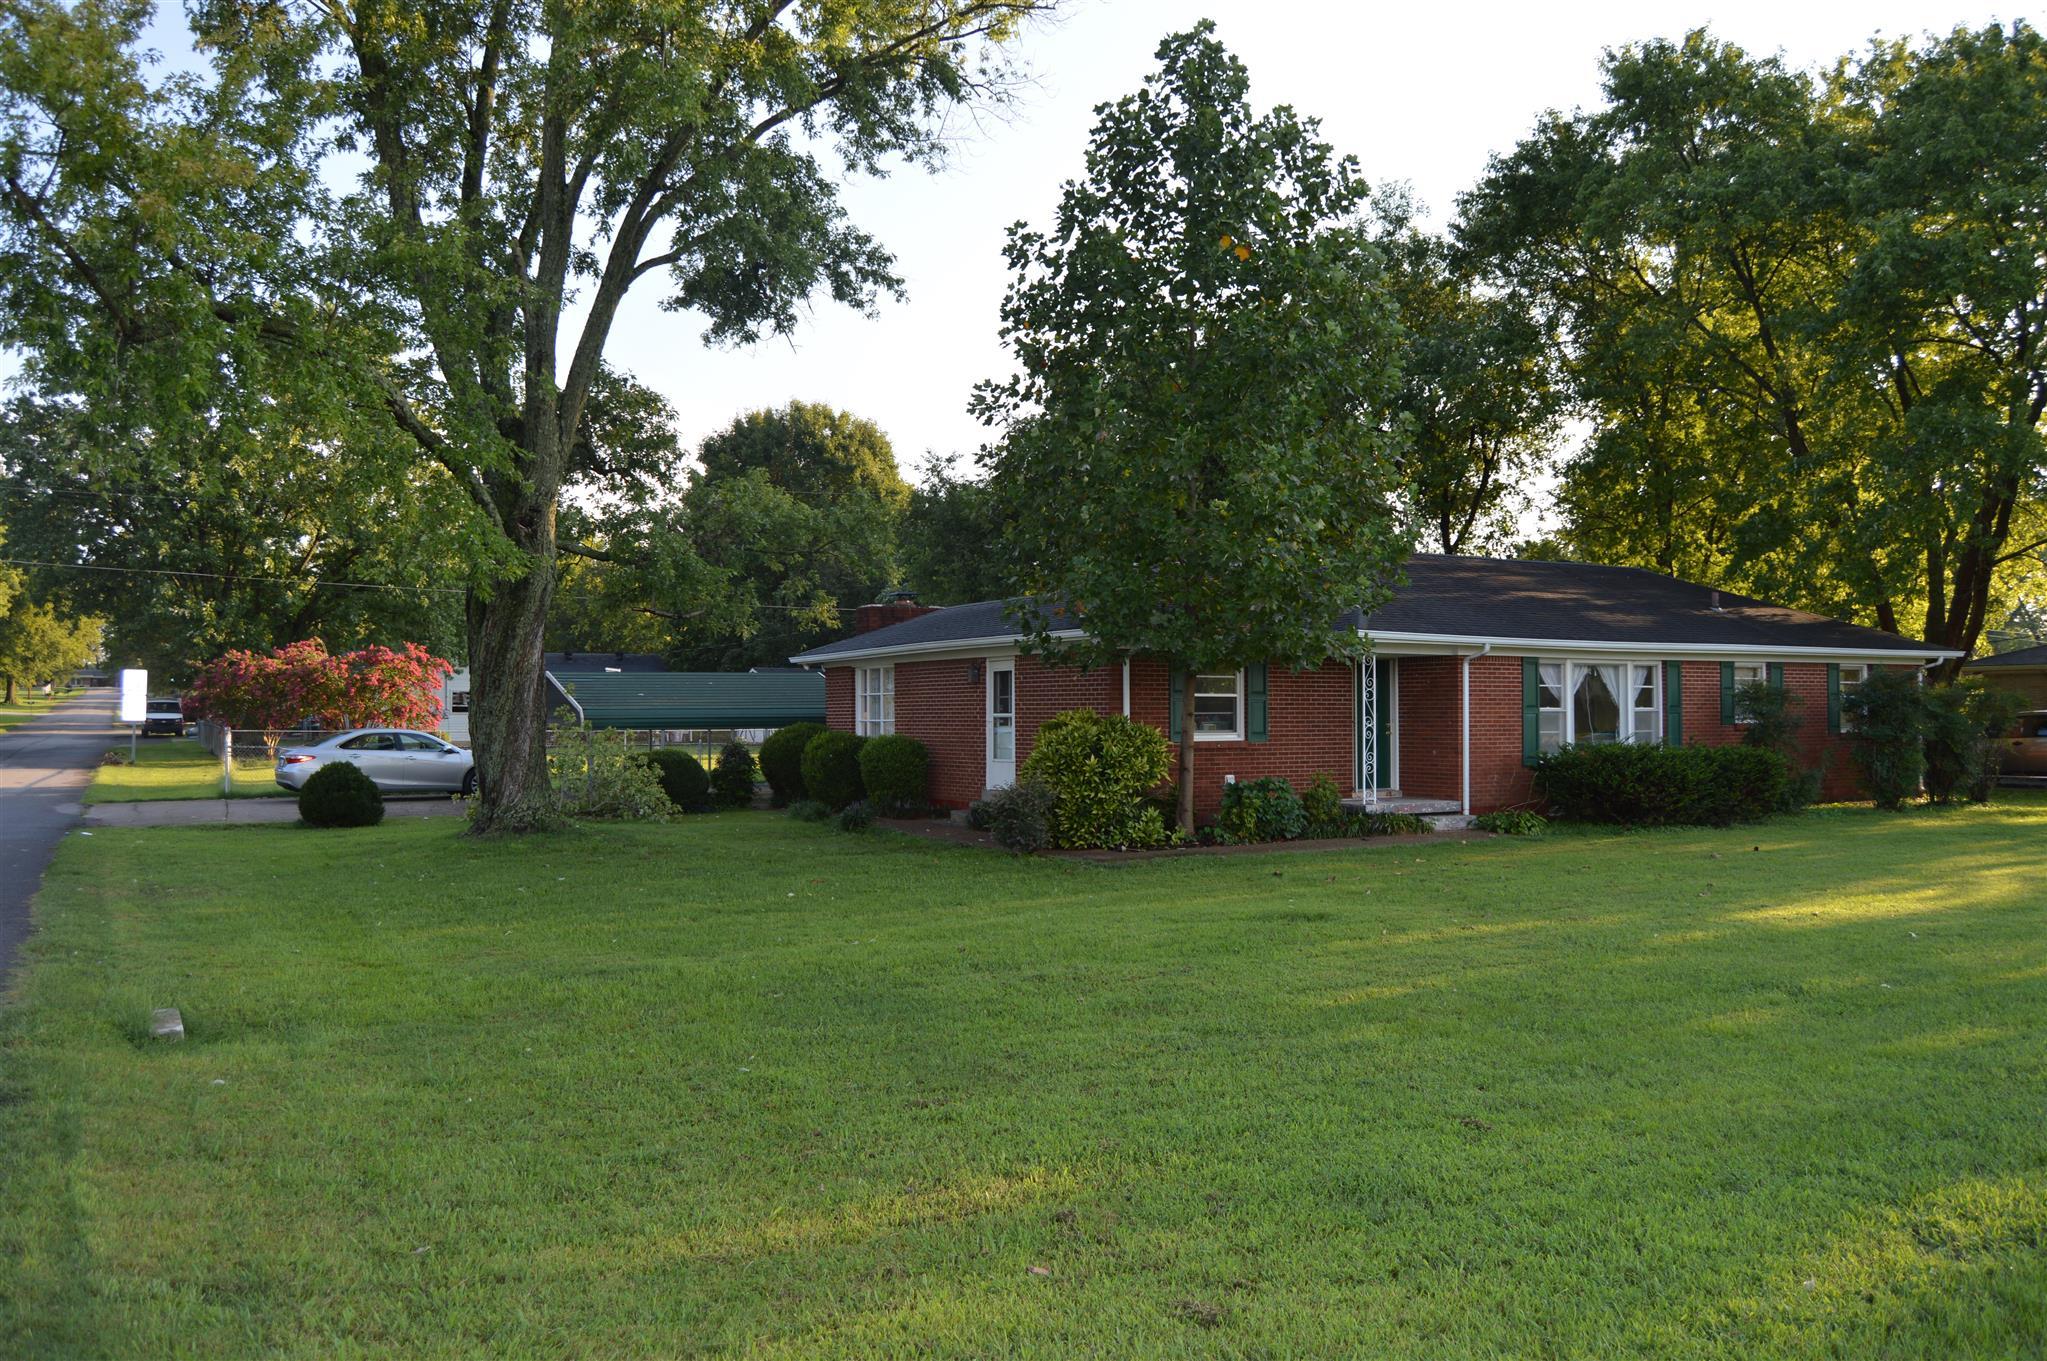 908 Sam Davis Rd, Smyrna, TN 37167